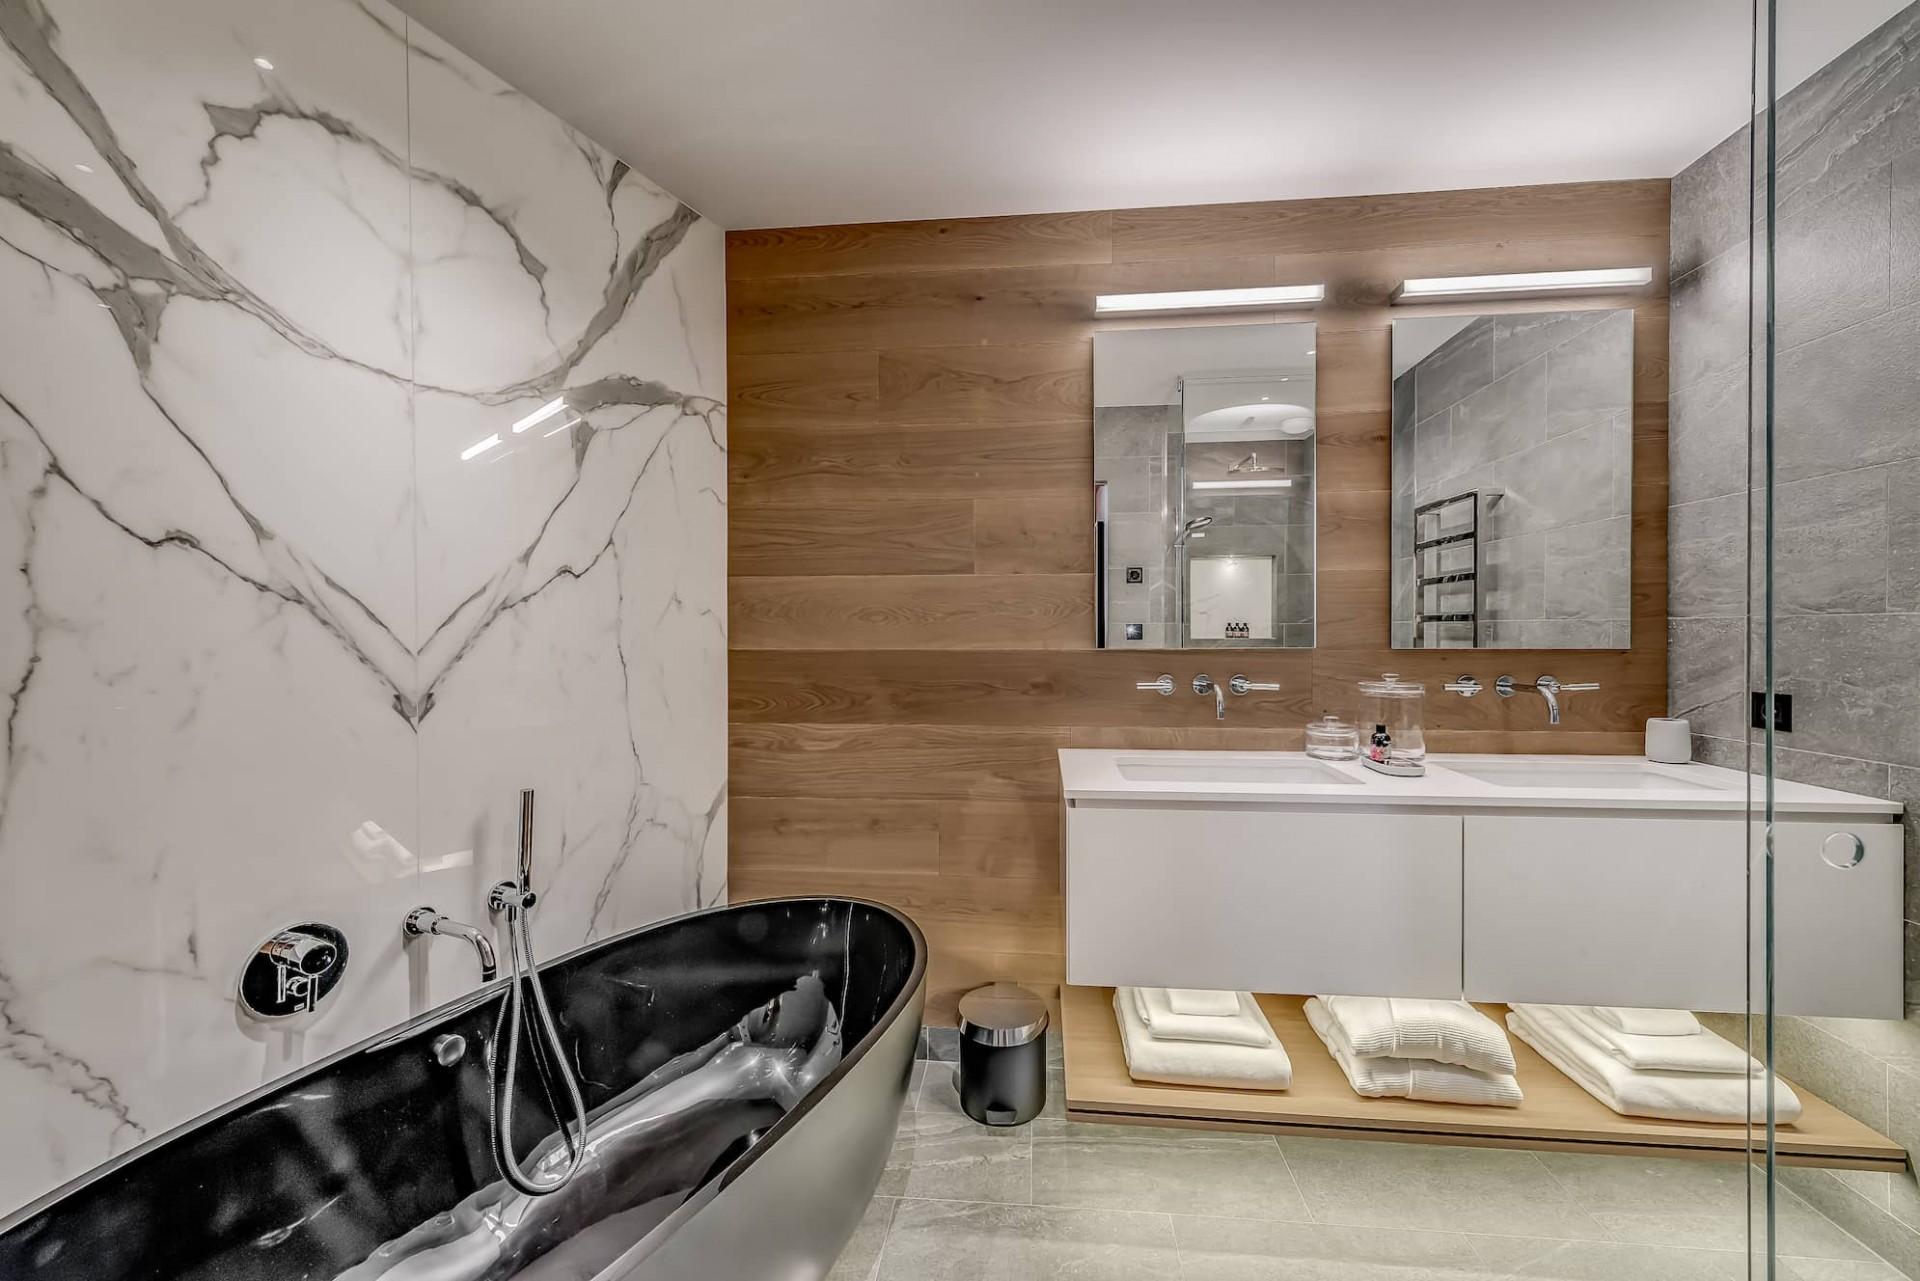 Courchevel 1650 Luxury Rental Chalet Elana Bathroom 2